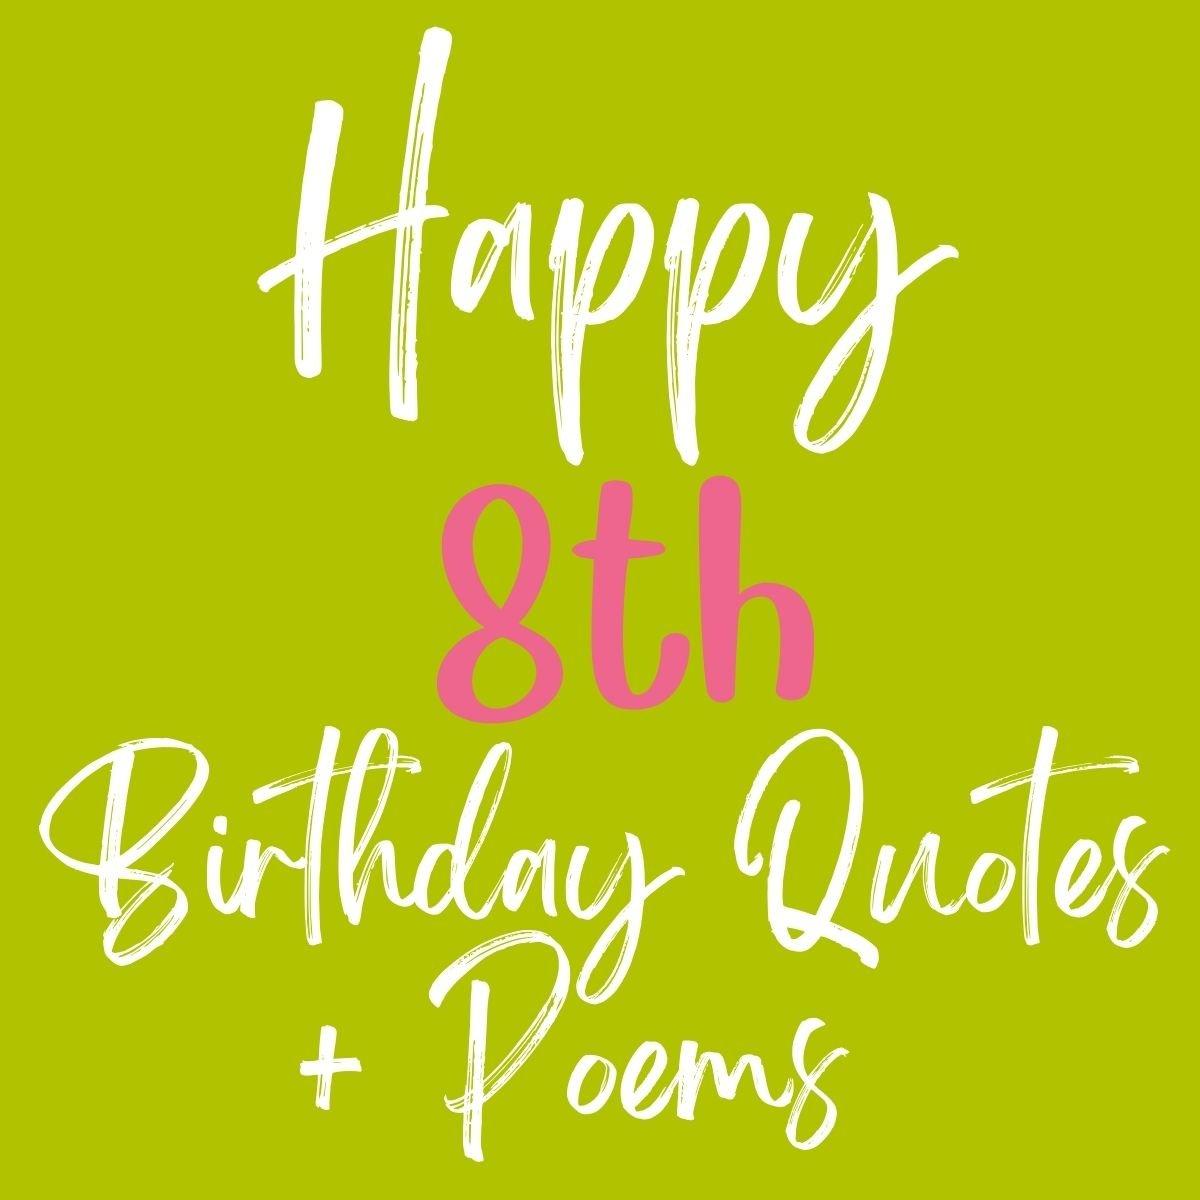 8th Birthday Quotes